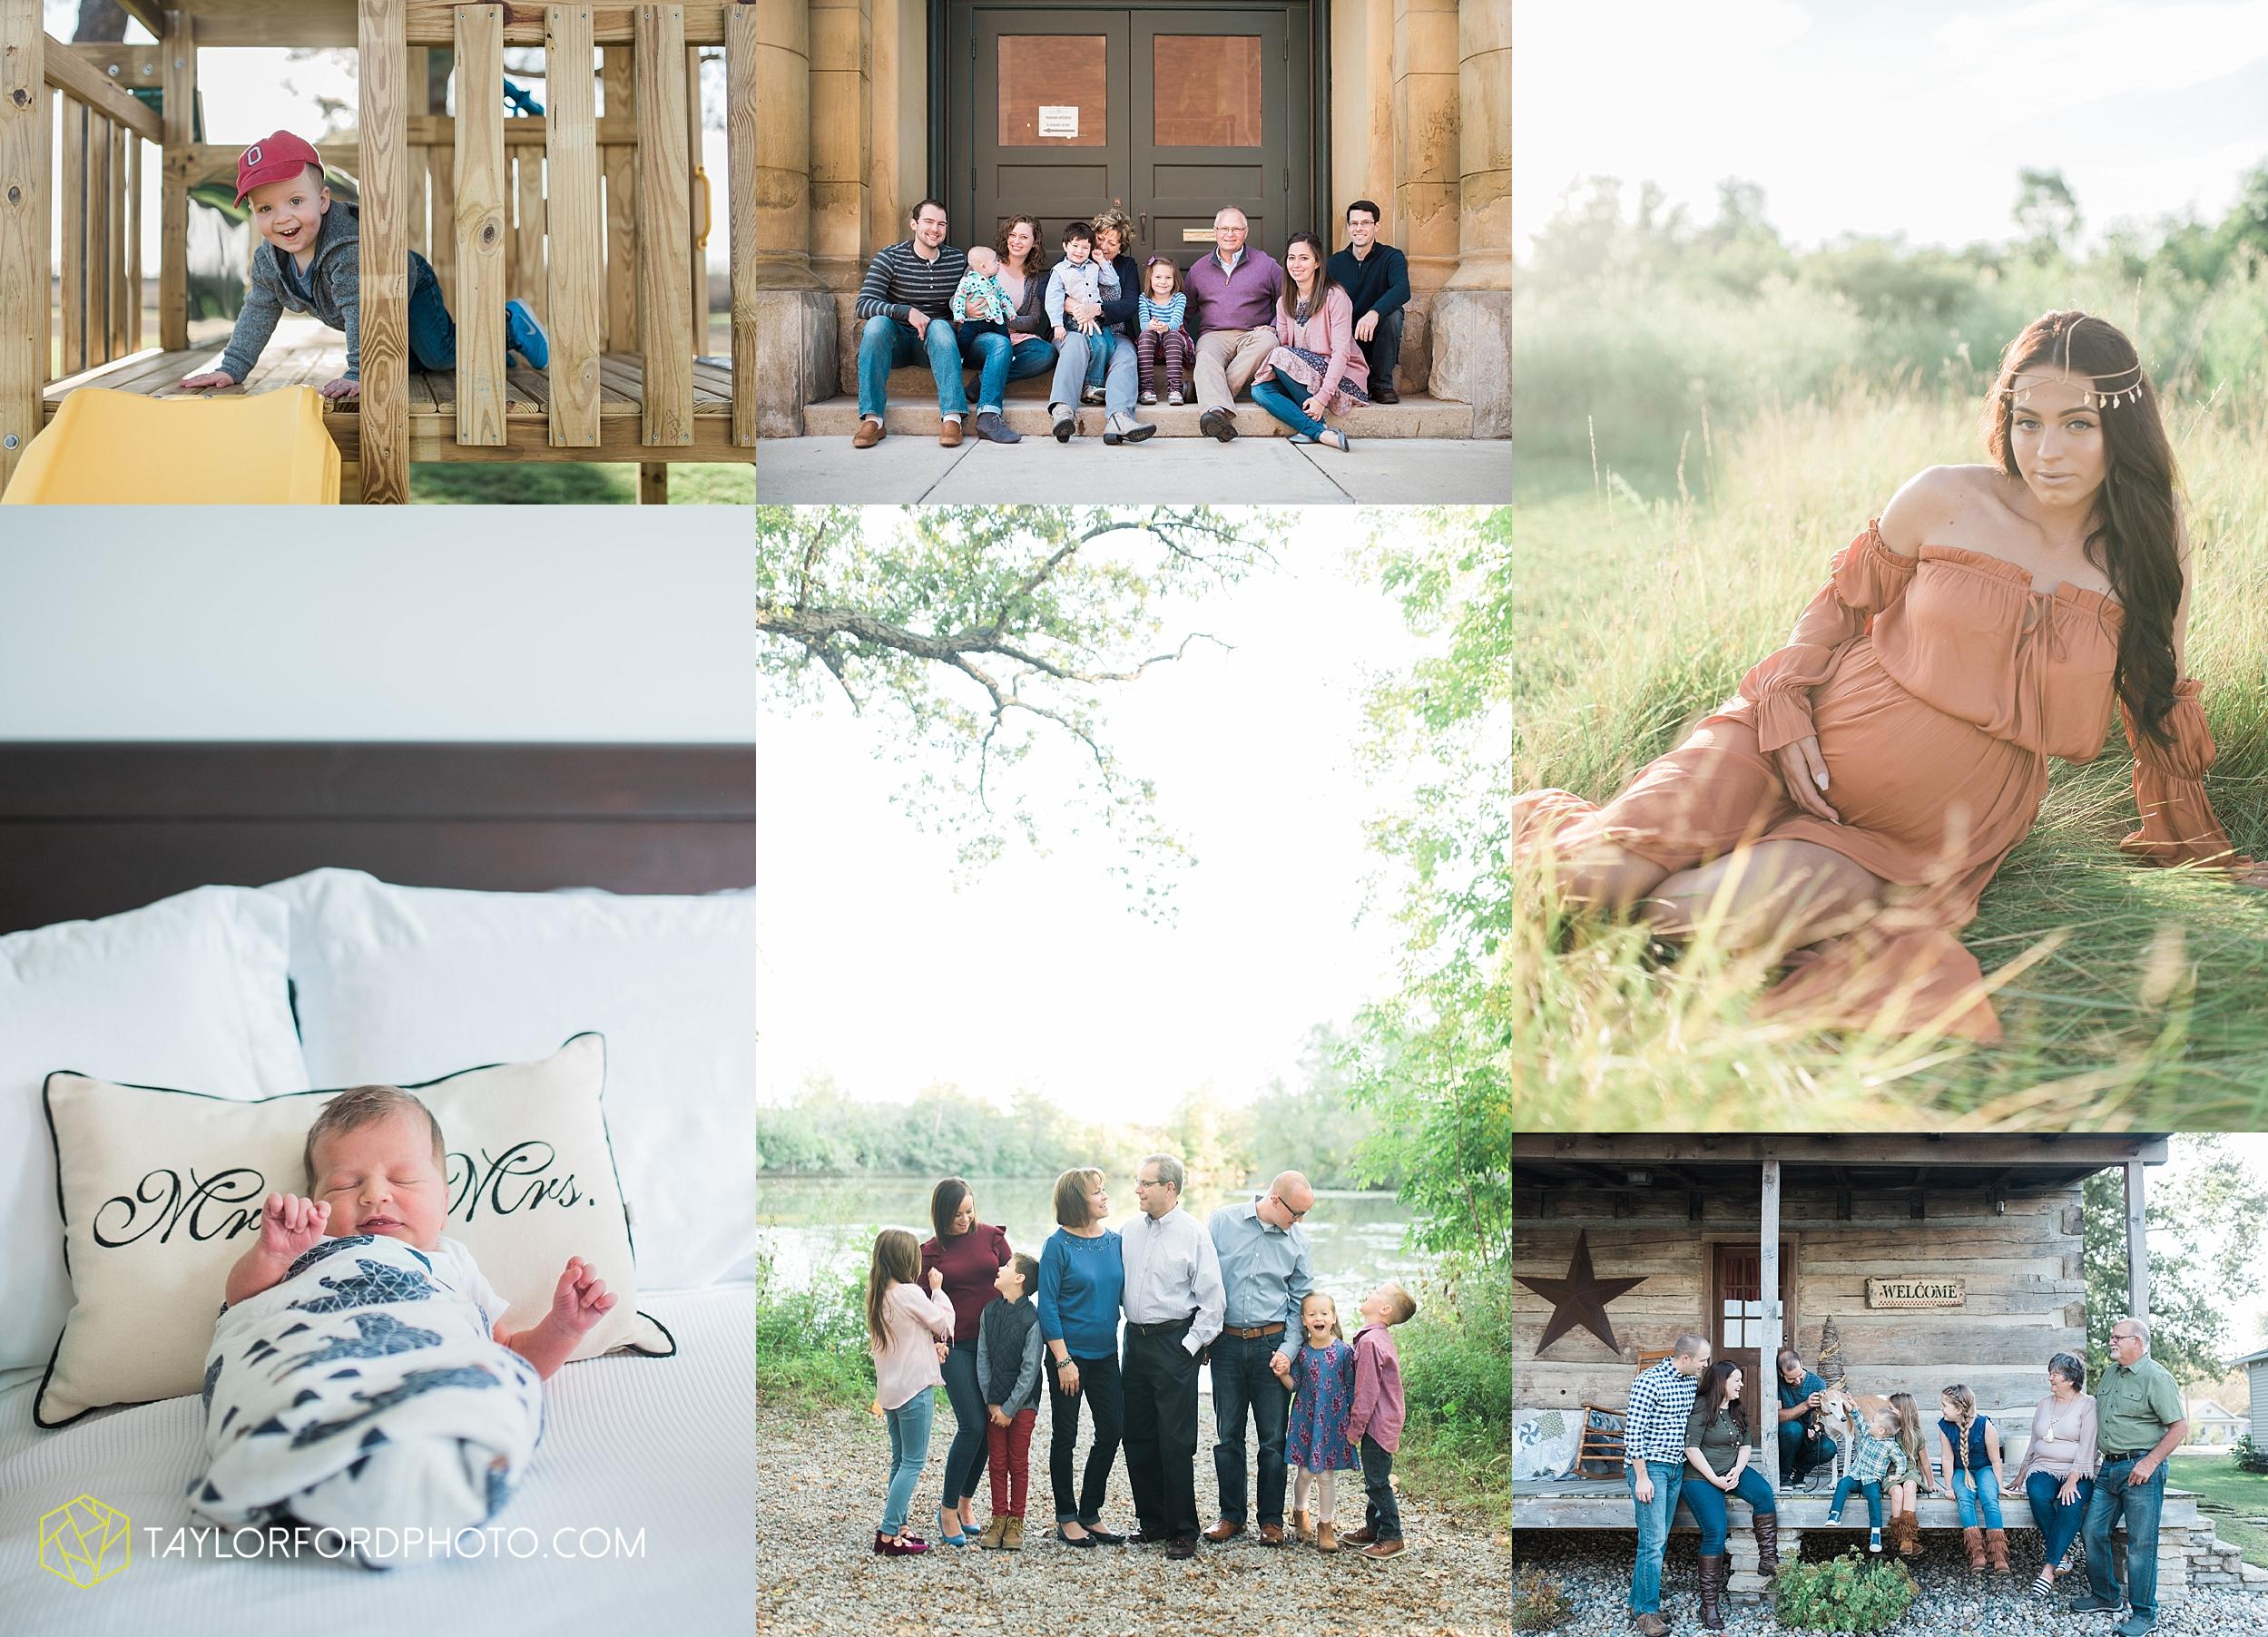 van-wert-ohio-fort-wayne-indiana-photographer-Taylor-Ford-Photography-wedding-engagement-family-senior_4407.jpg